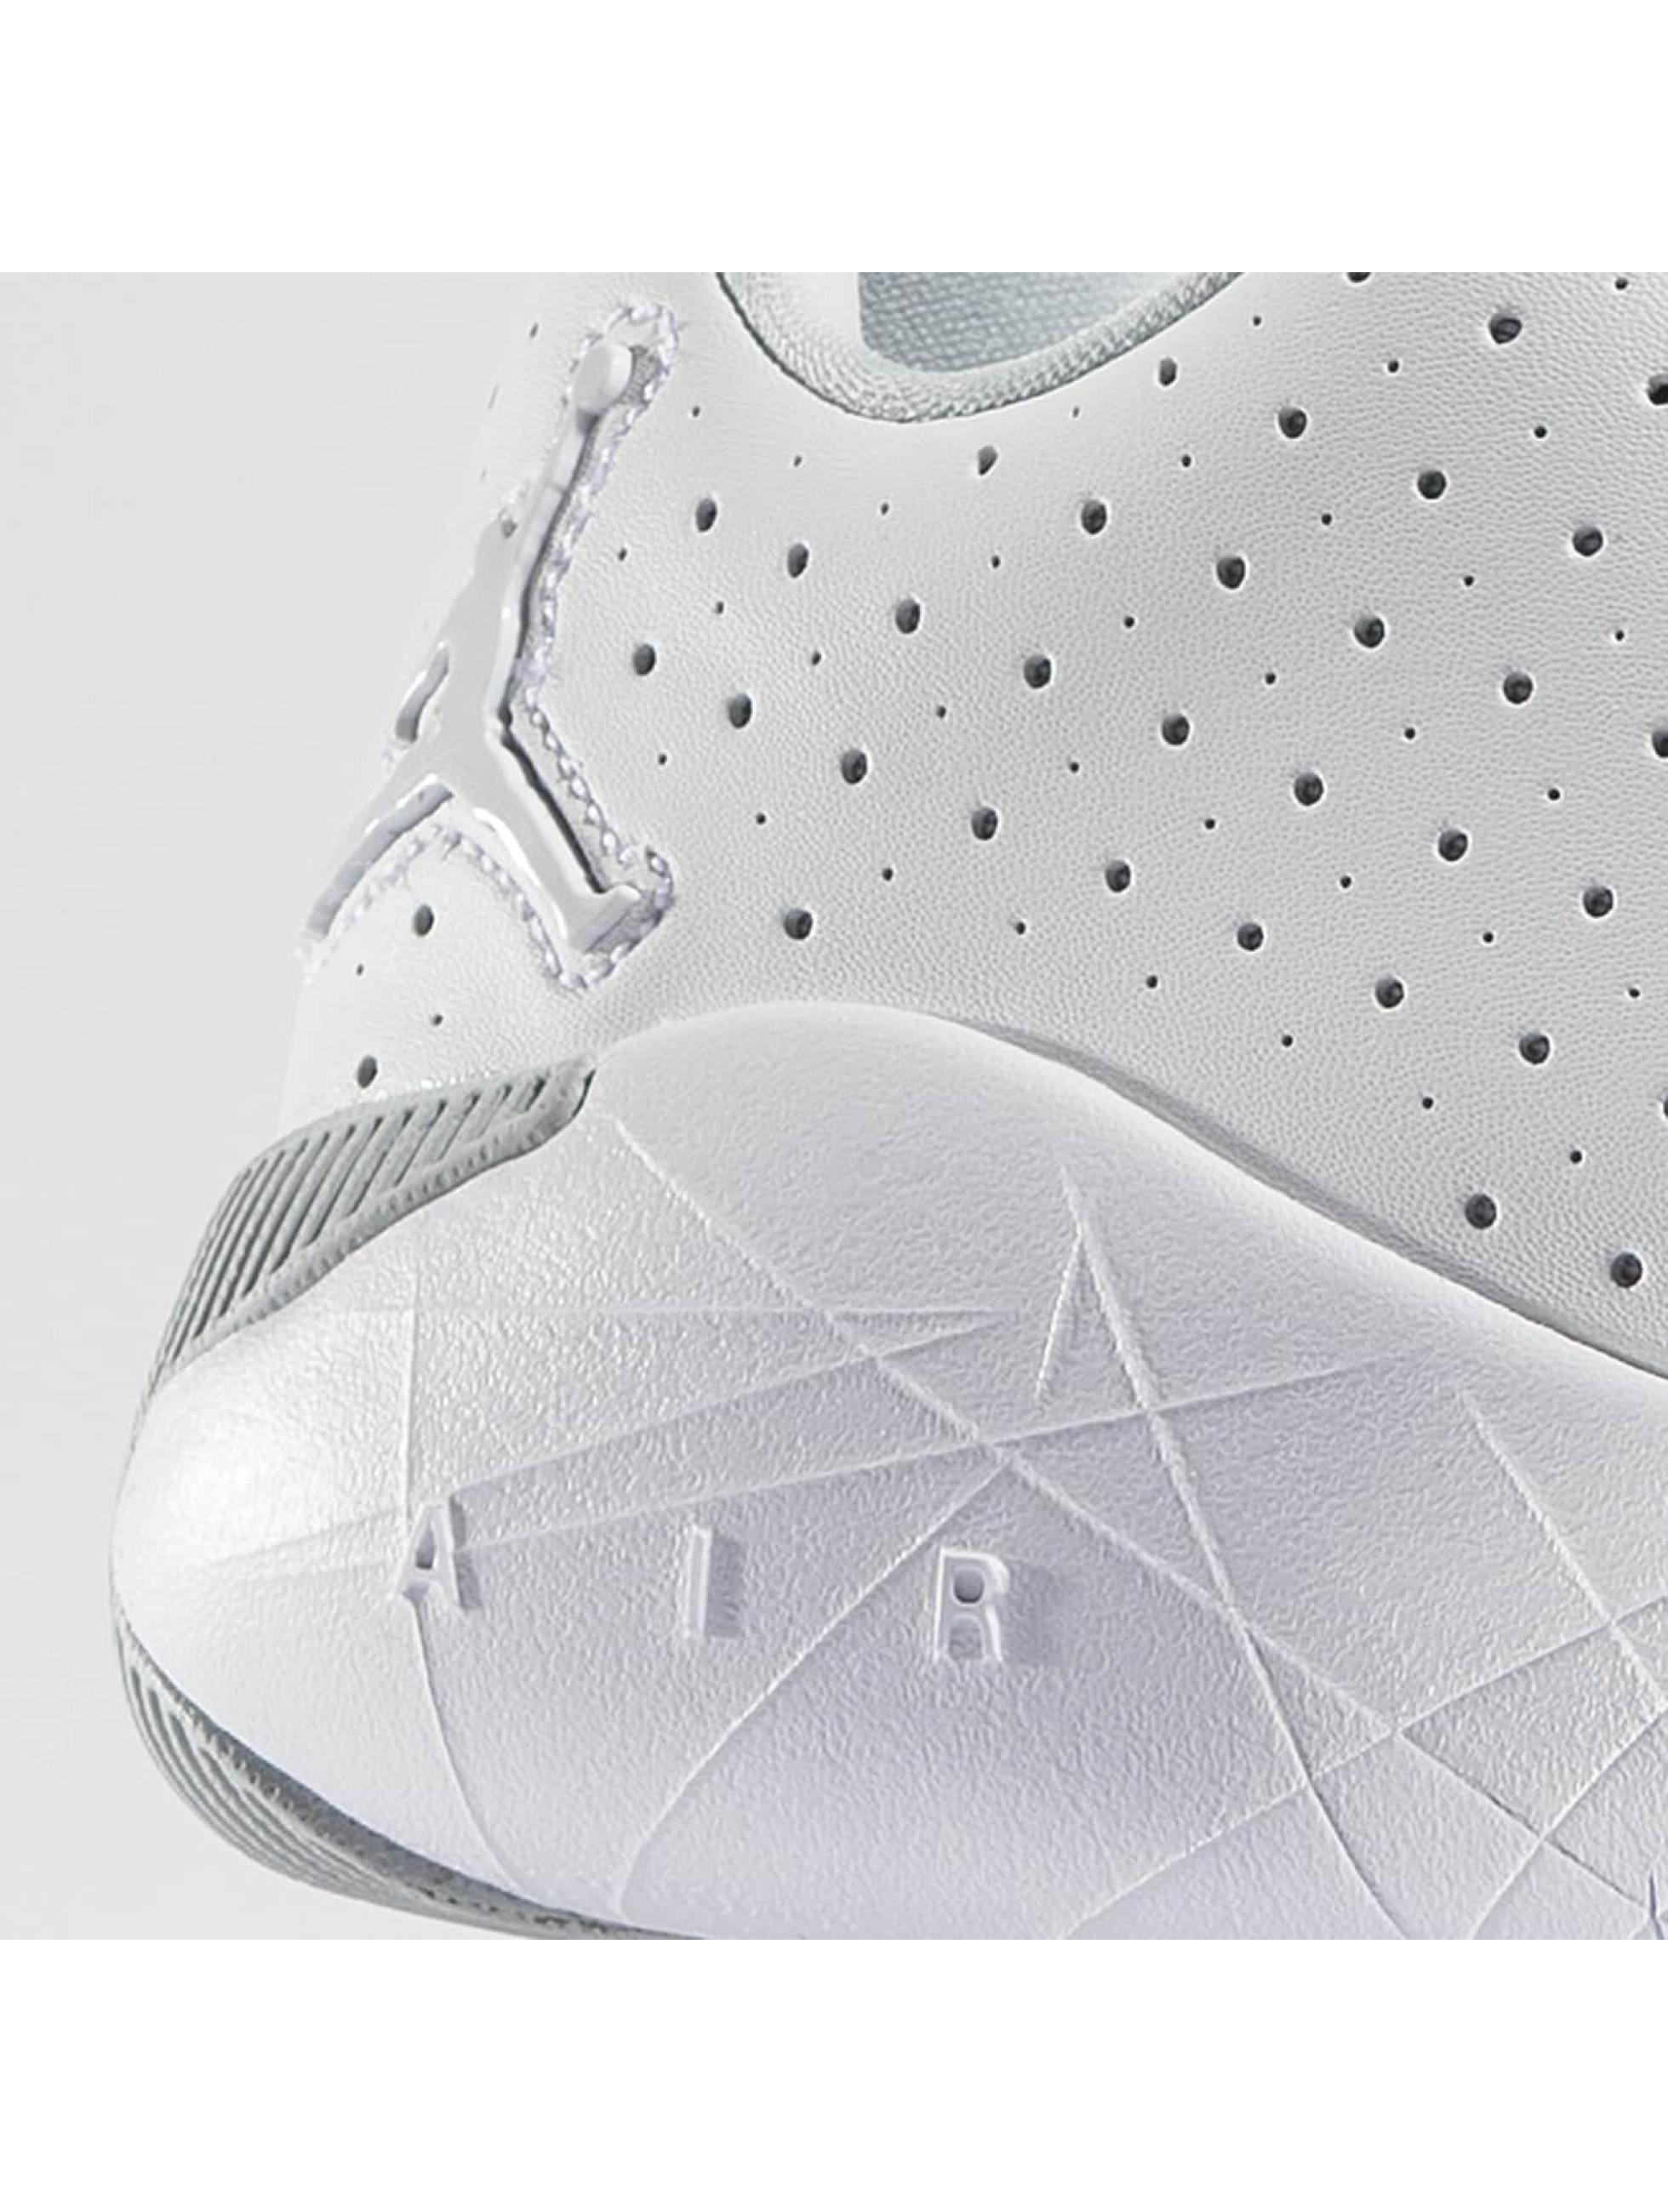 Jordan Sneakers Breakout white